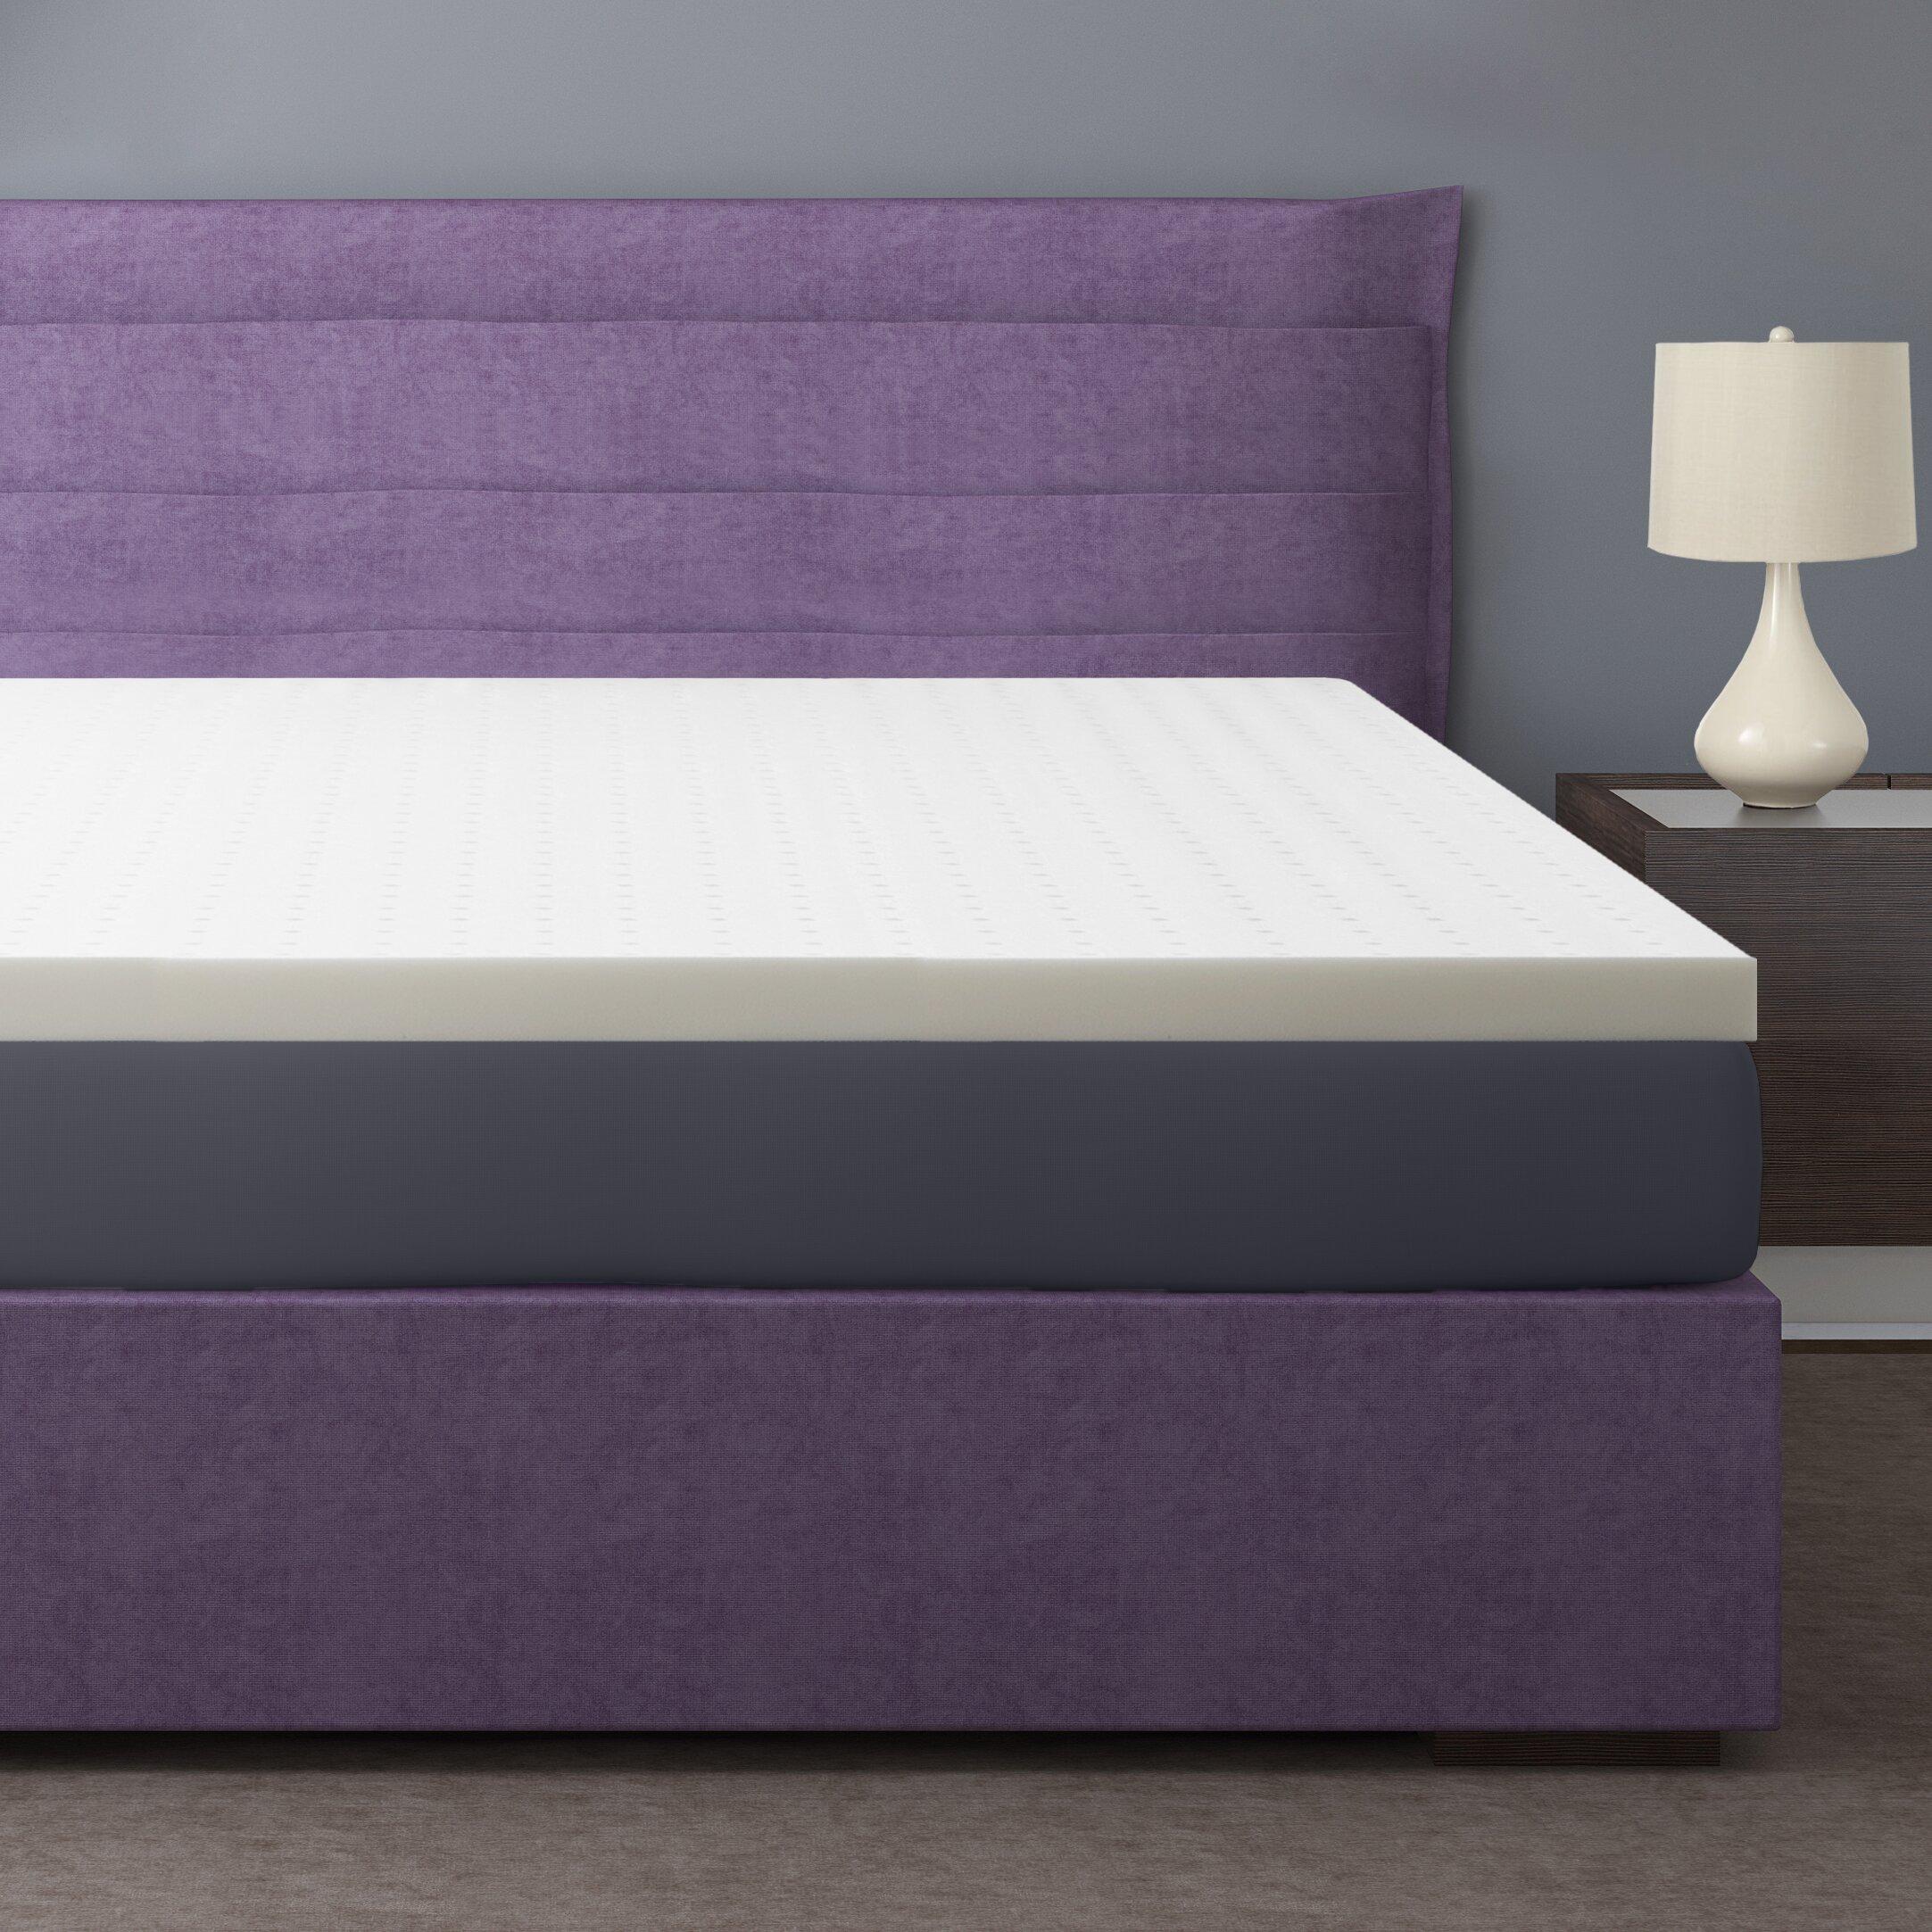 "Best Price Quality 2 5"" Ventilated Memory Foam Mattress"